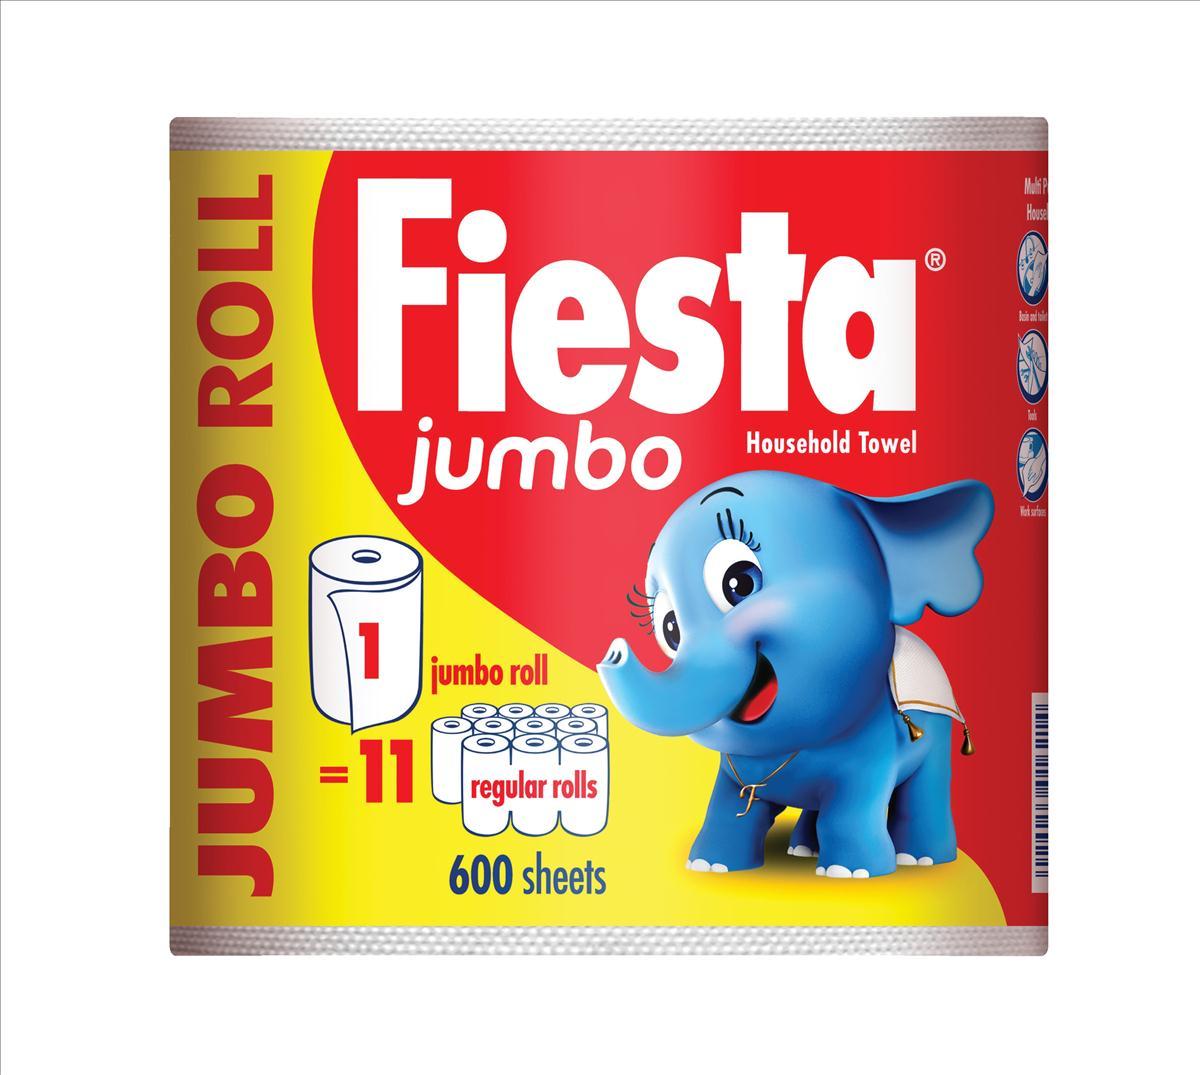 Fiesta Kitchen Towel Jumbo Roll 600 Sheets Ref M01387